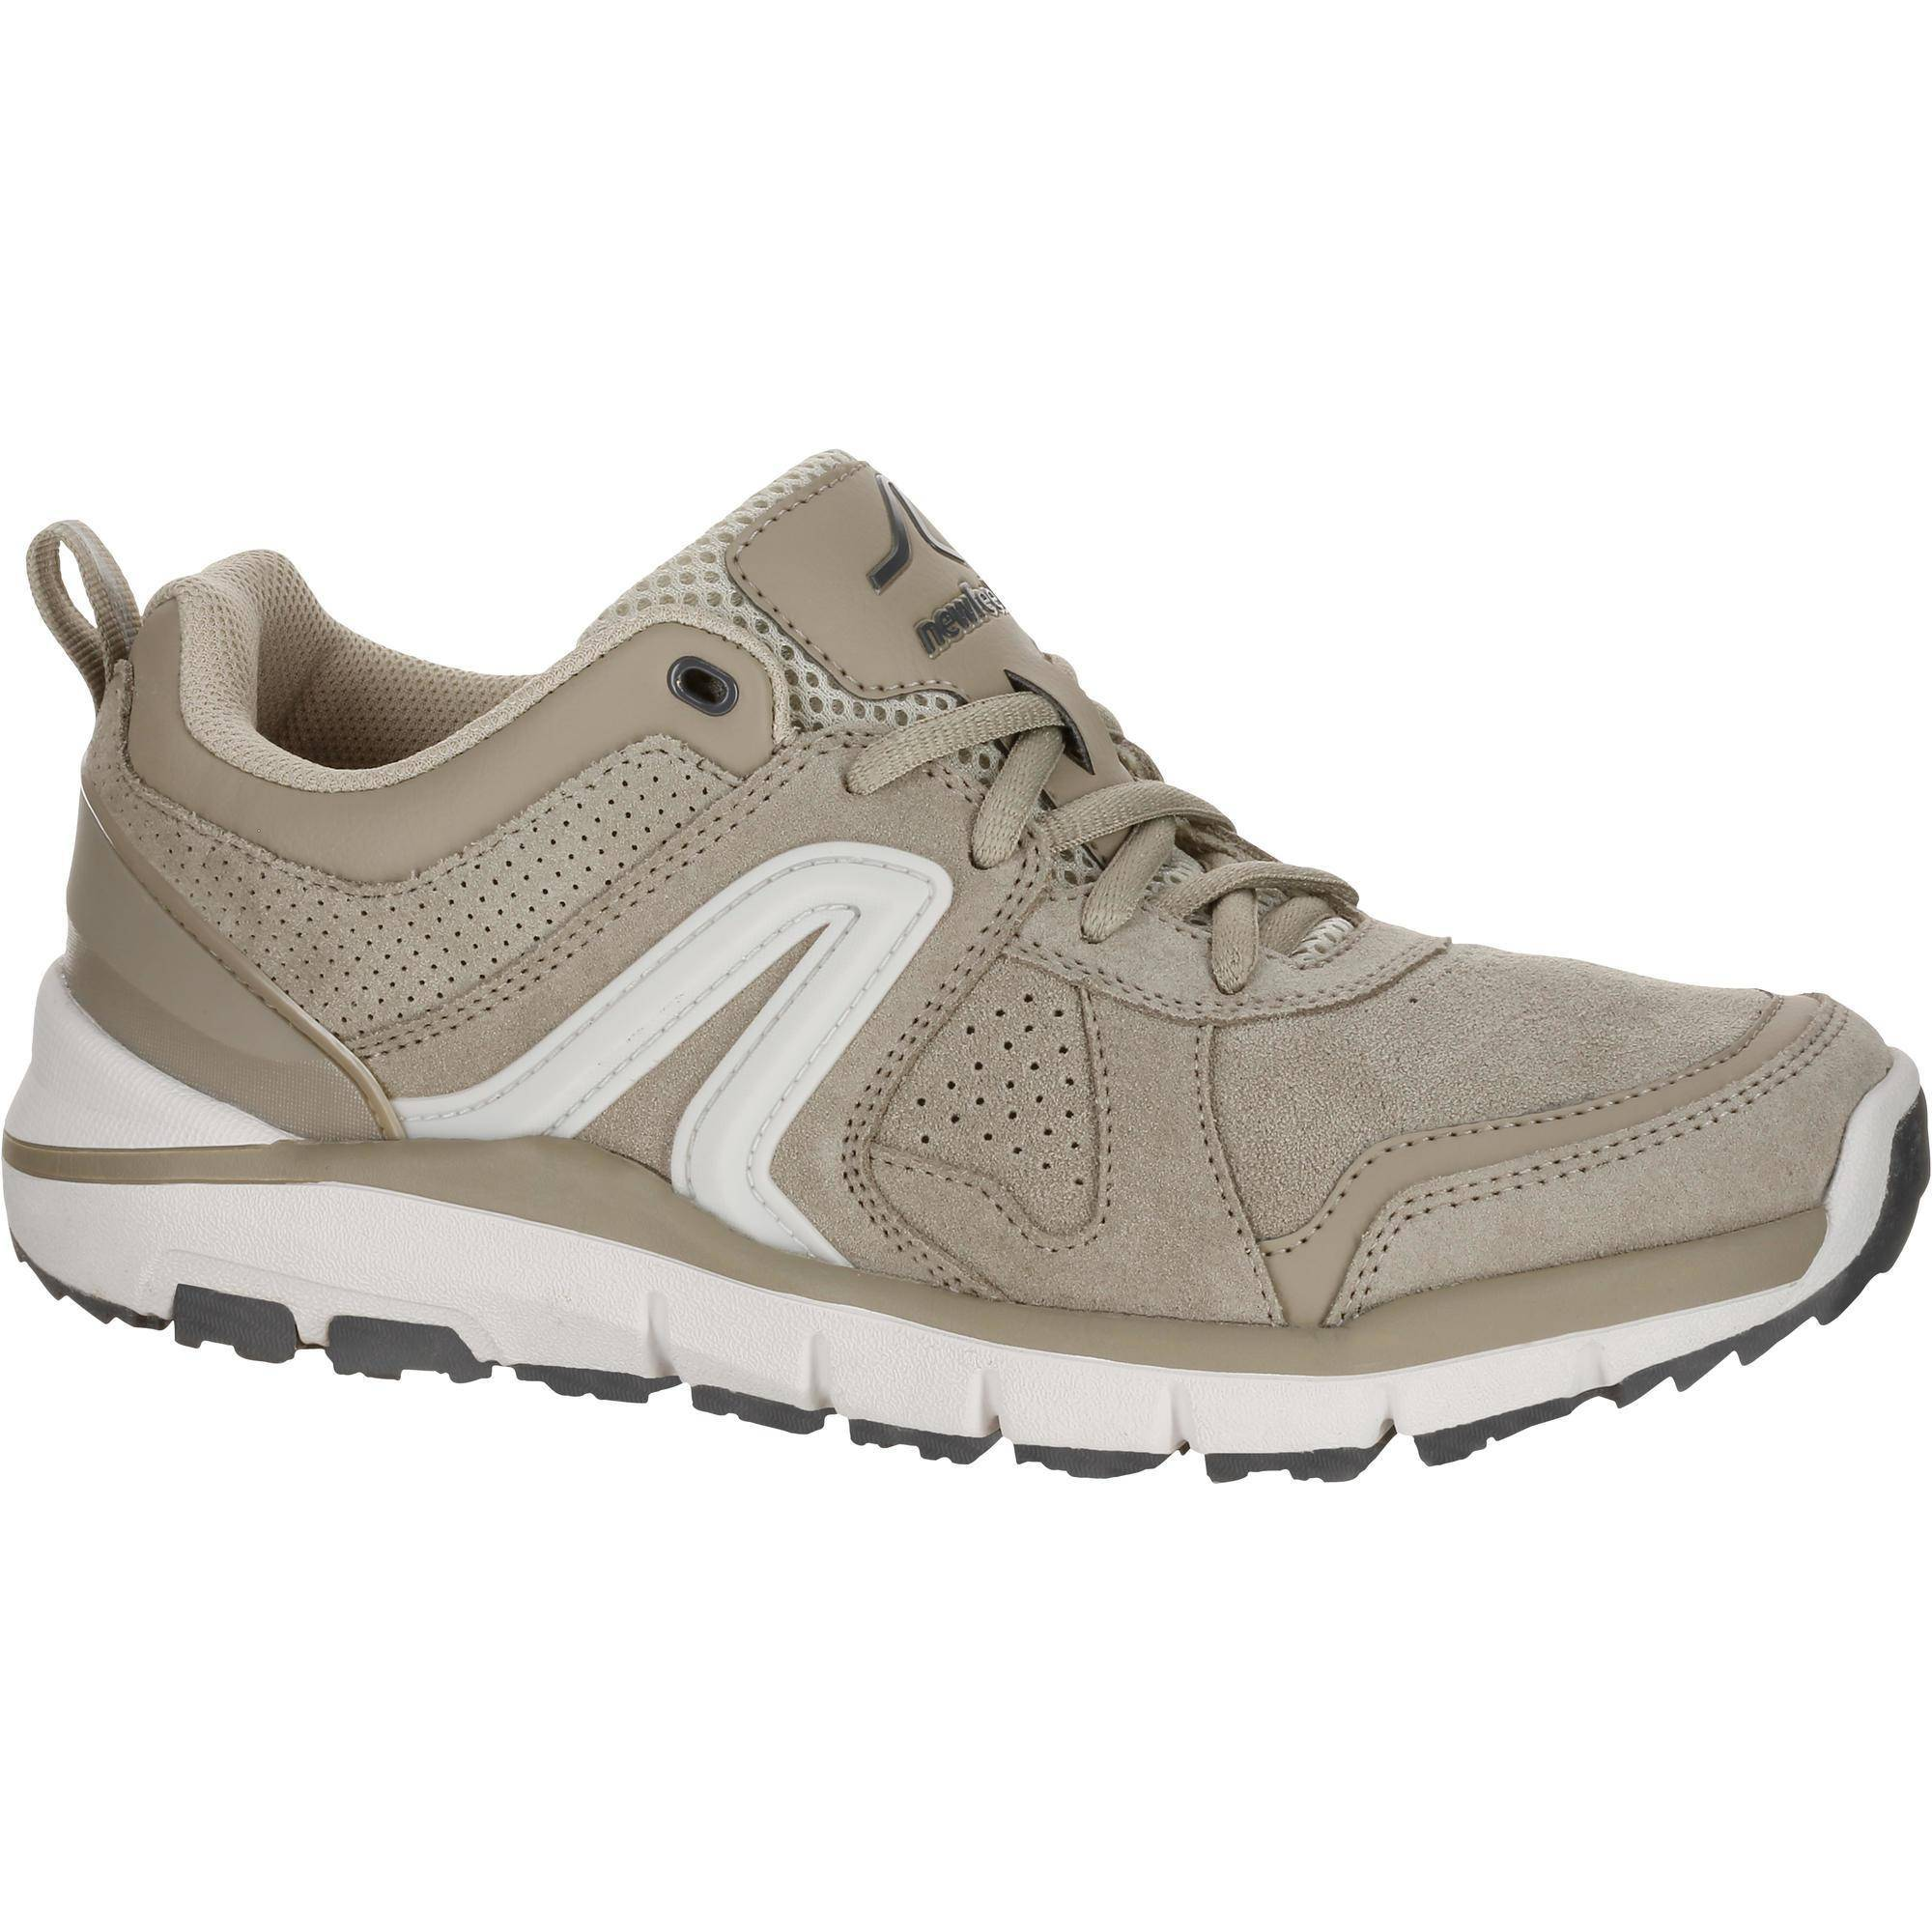 Newfeel Chaussures marche sportive femme HW 540 cuir beige - Newfeel